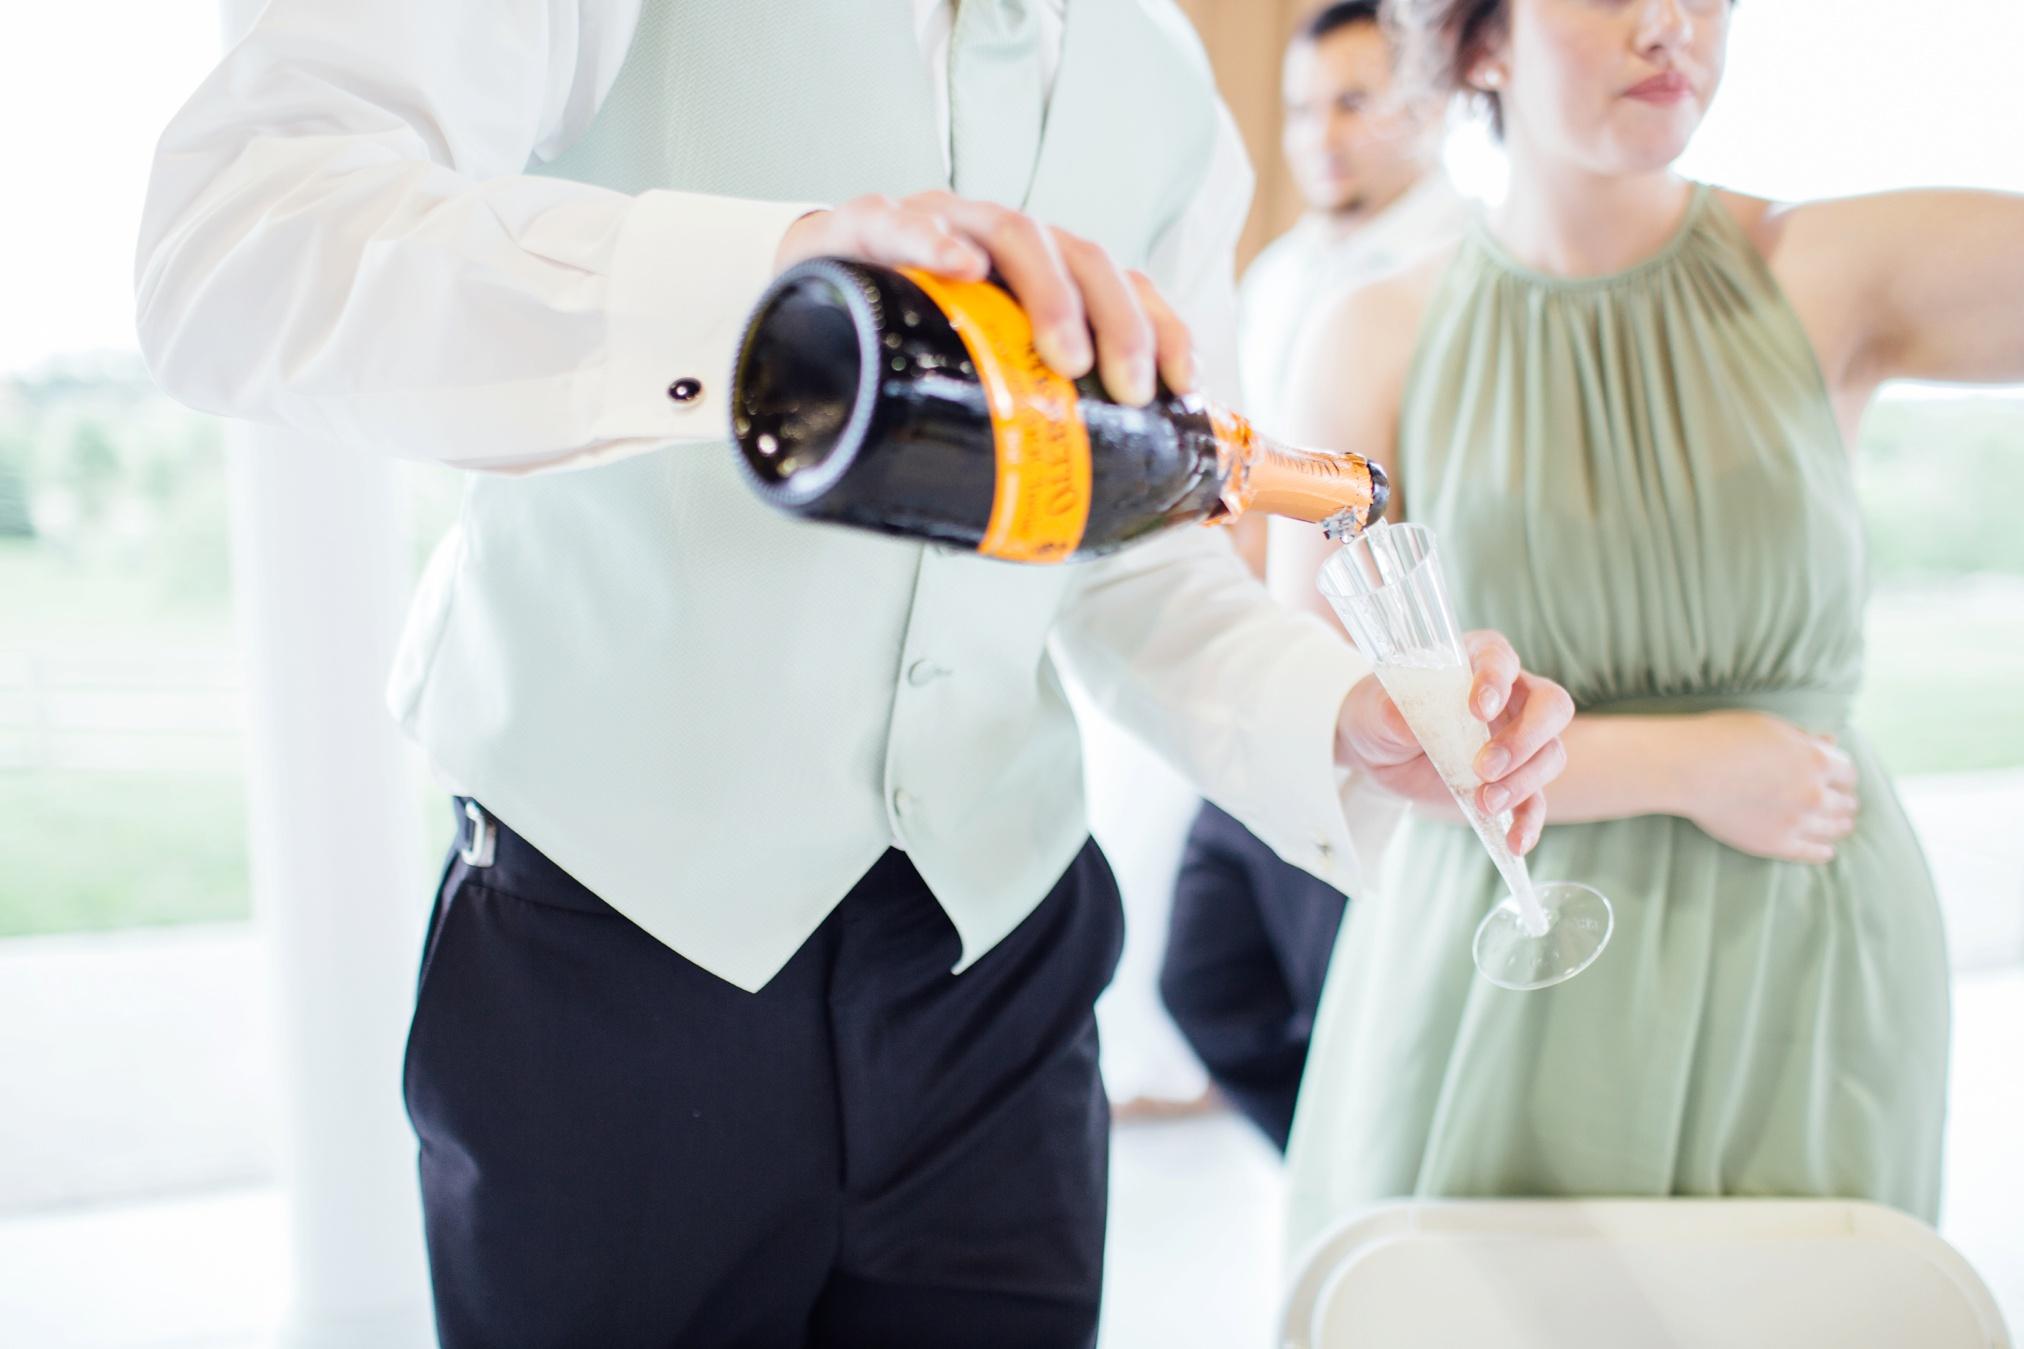 schmid_wedding-708.jpg